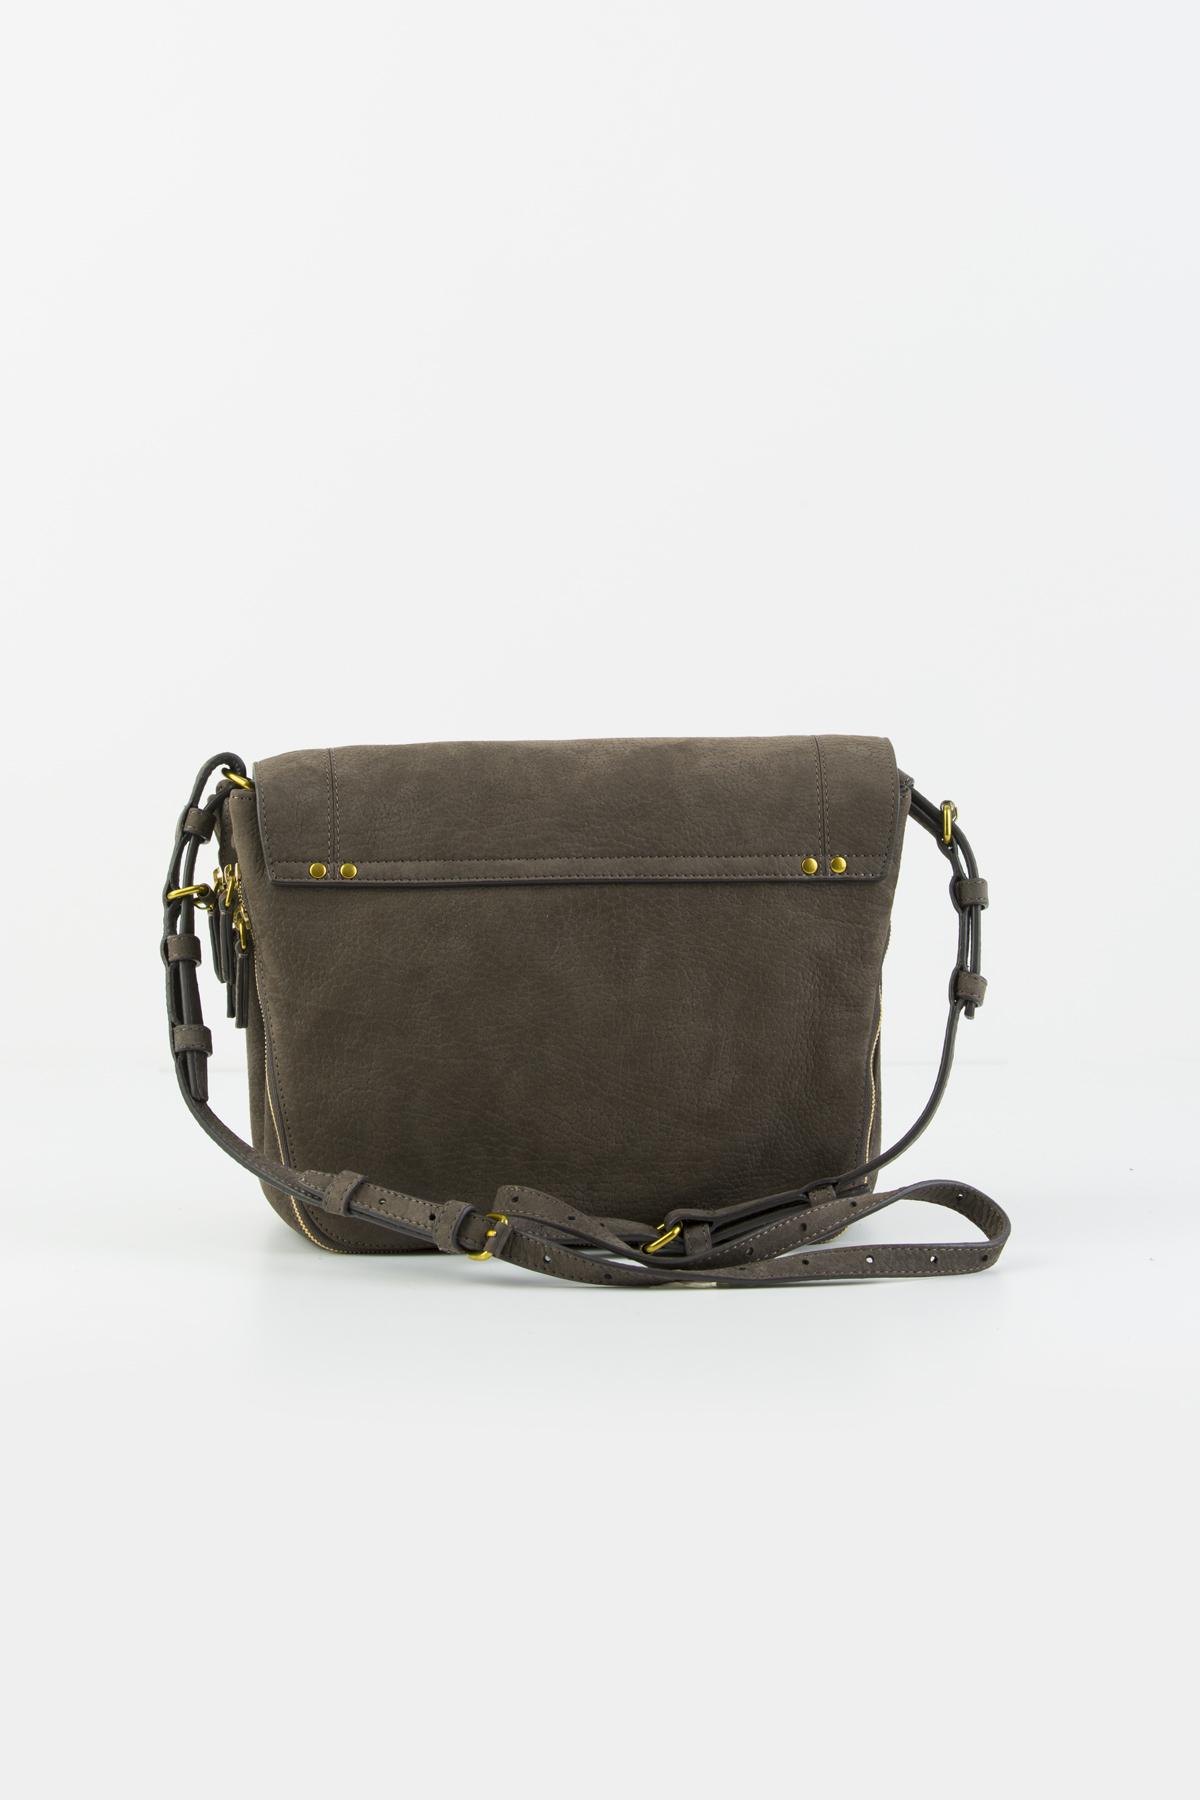 igor-elephant-grey-leather-bag-messenger-jerome-freyfuss-matchboxathens